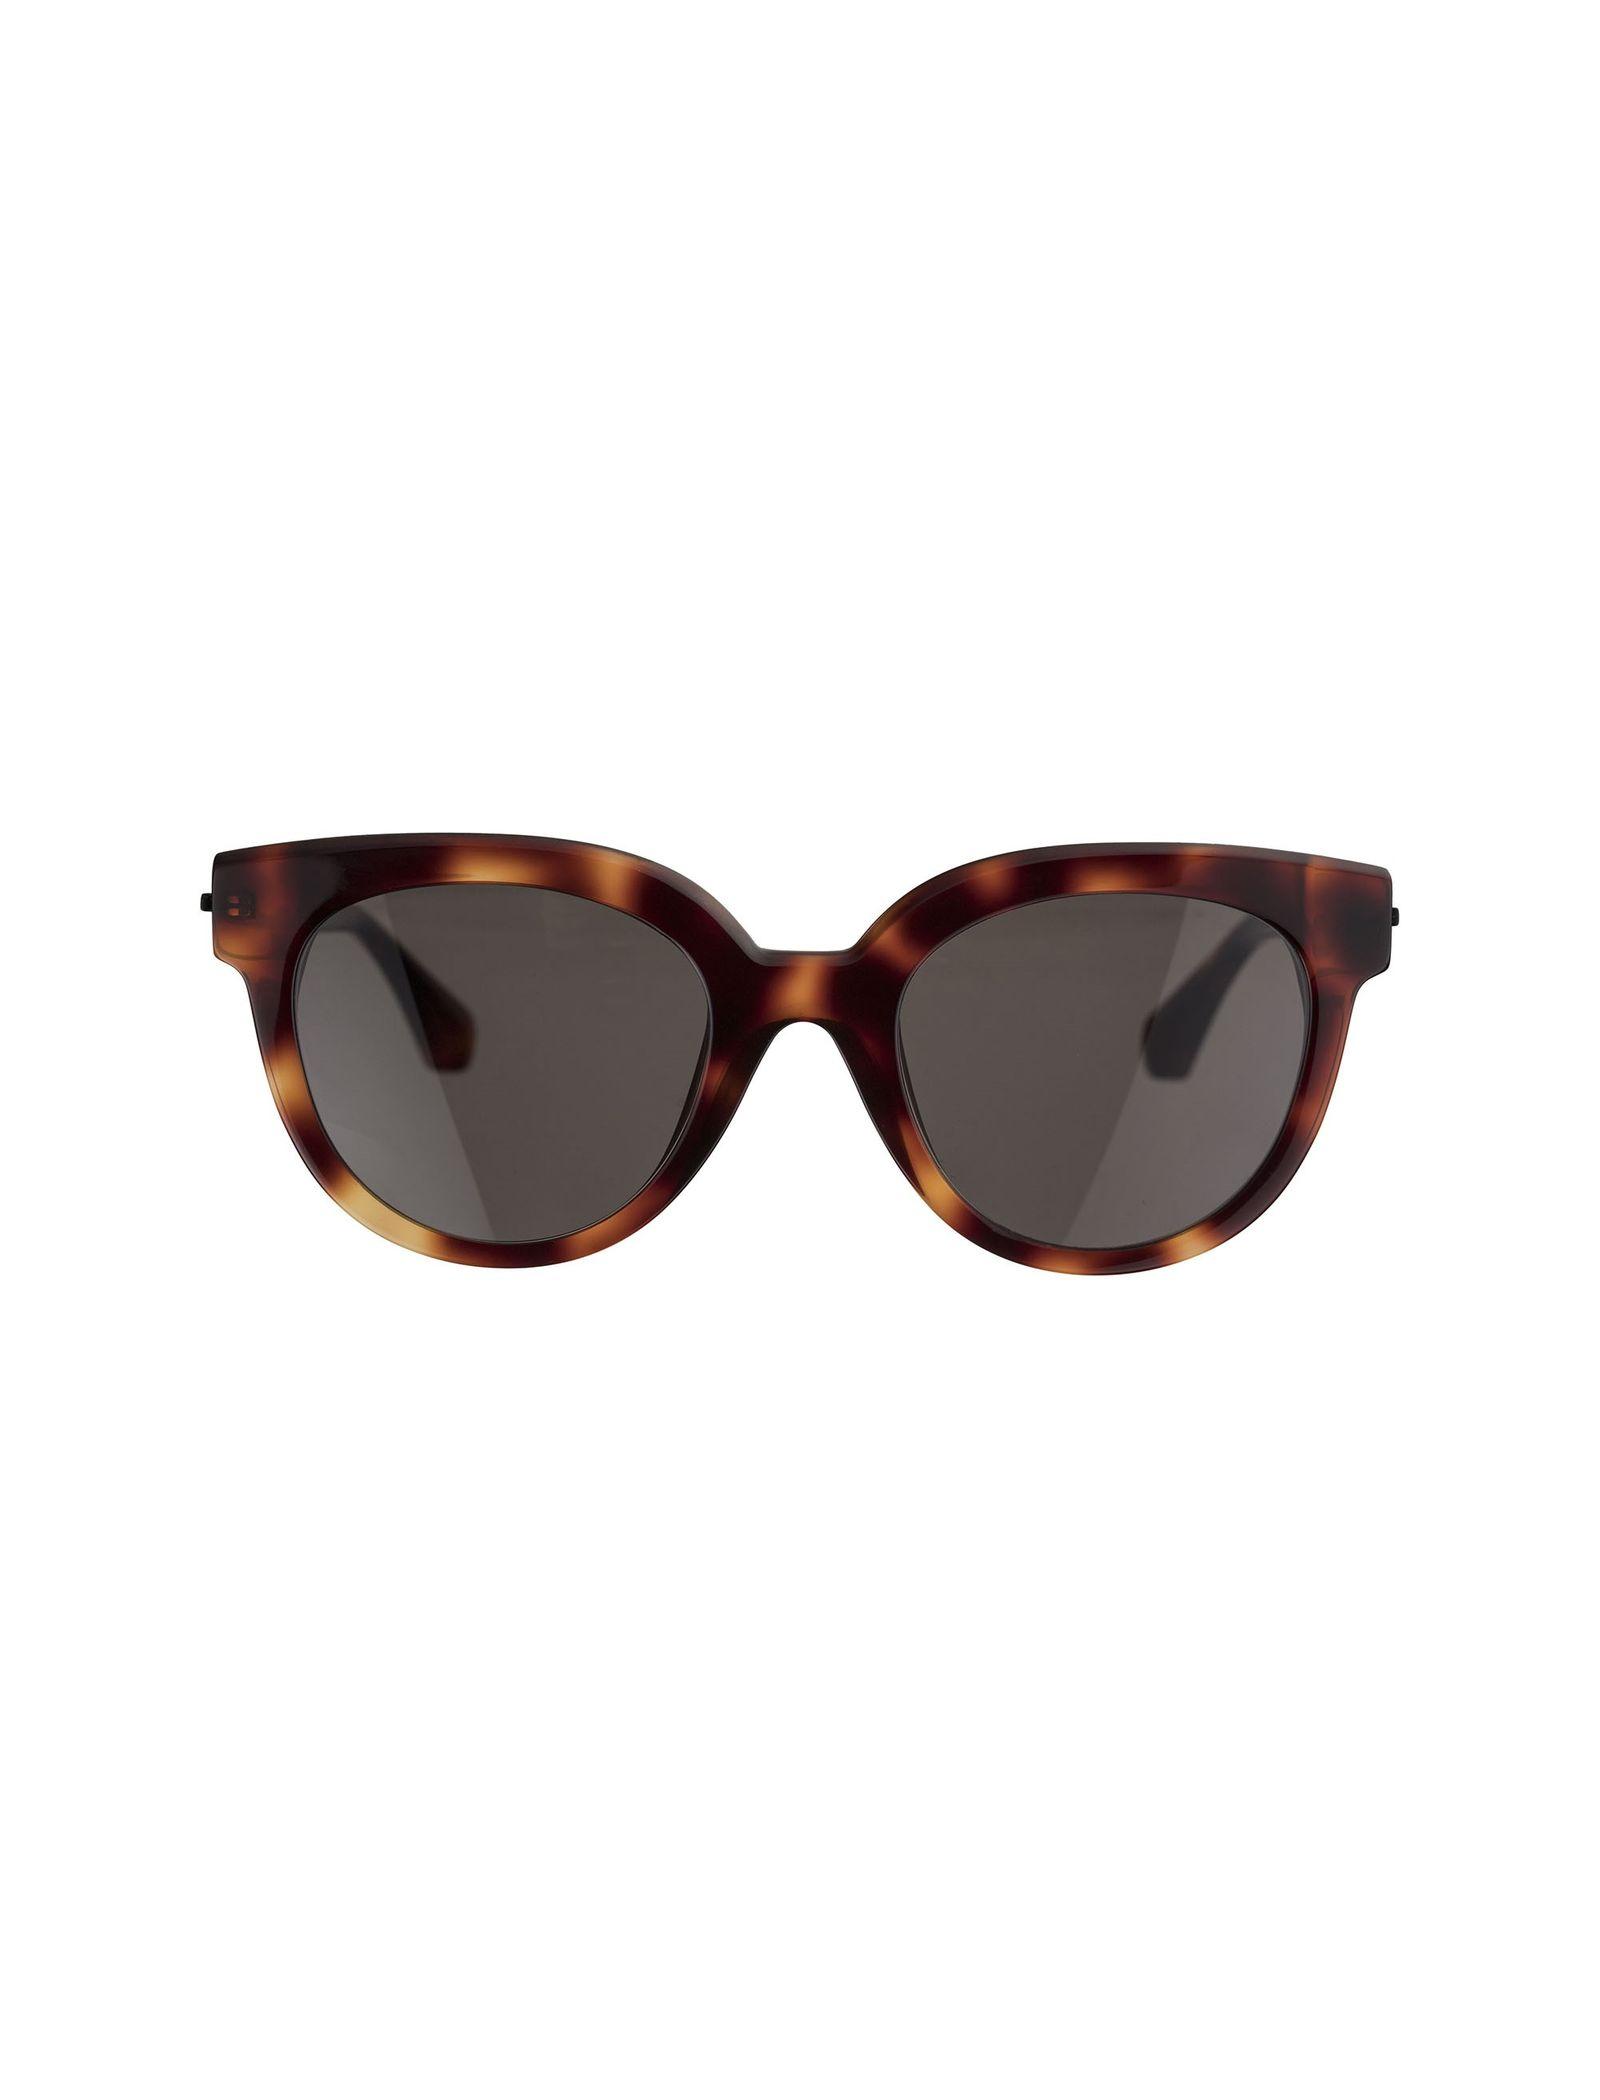 عینک آفتابی پنتوس زنانه - ساندرو - قهوه اي  - 1